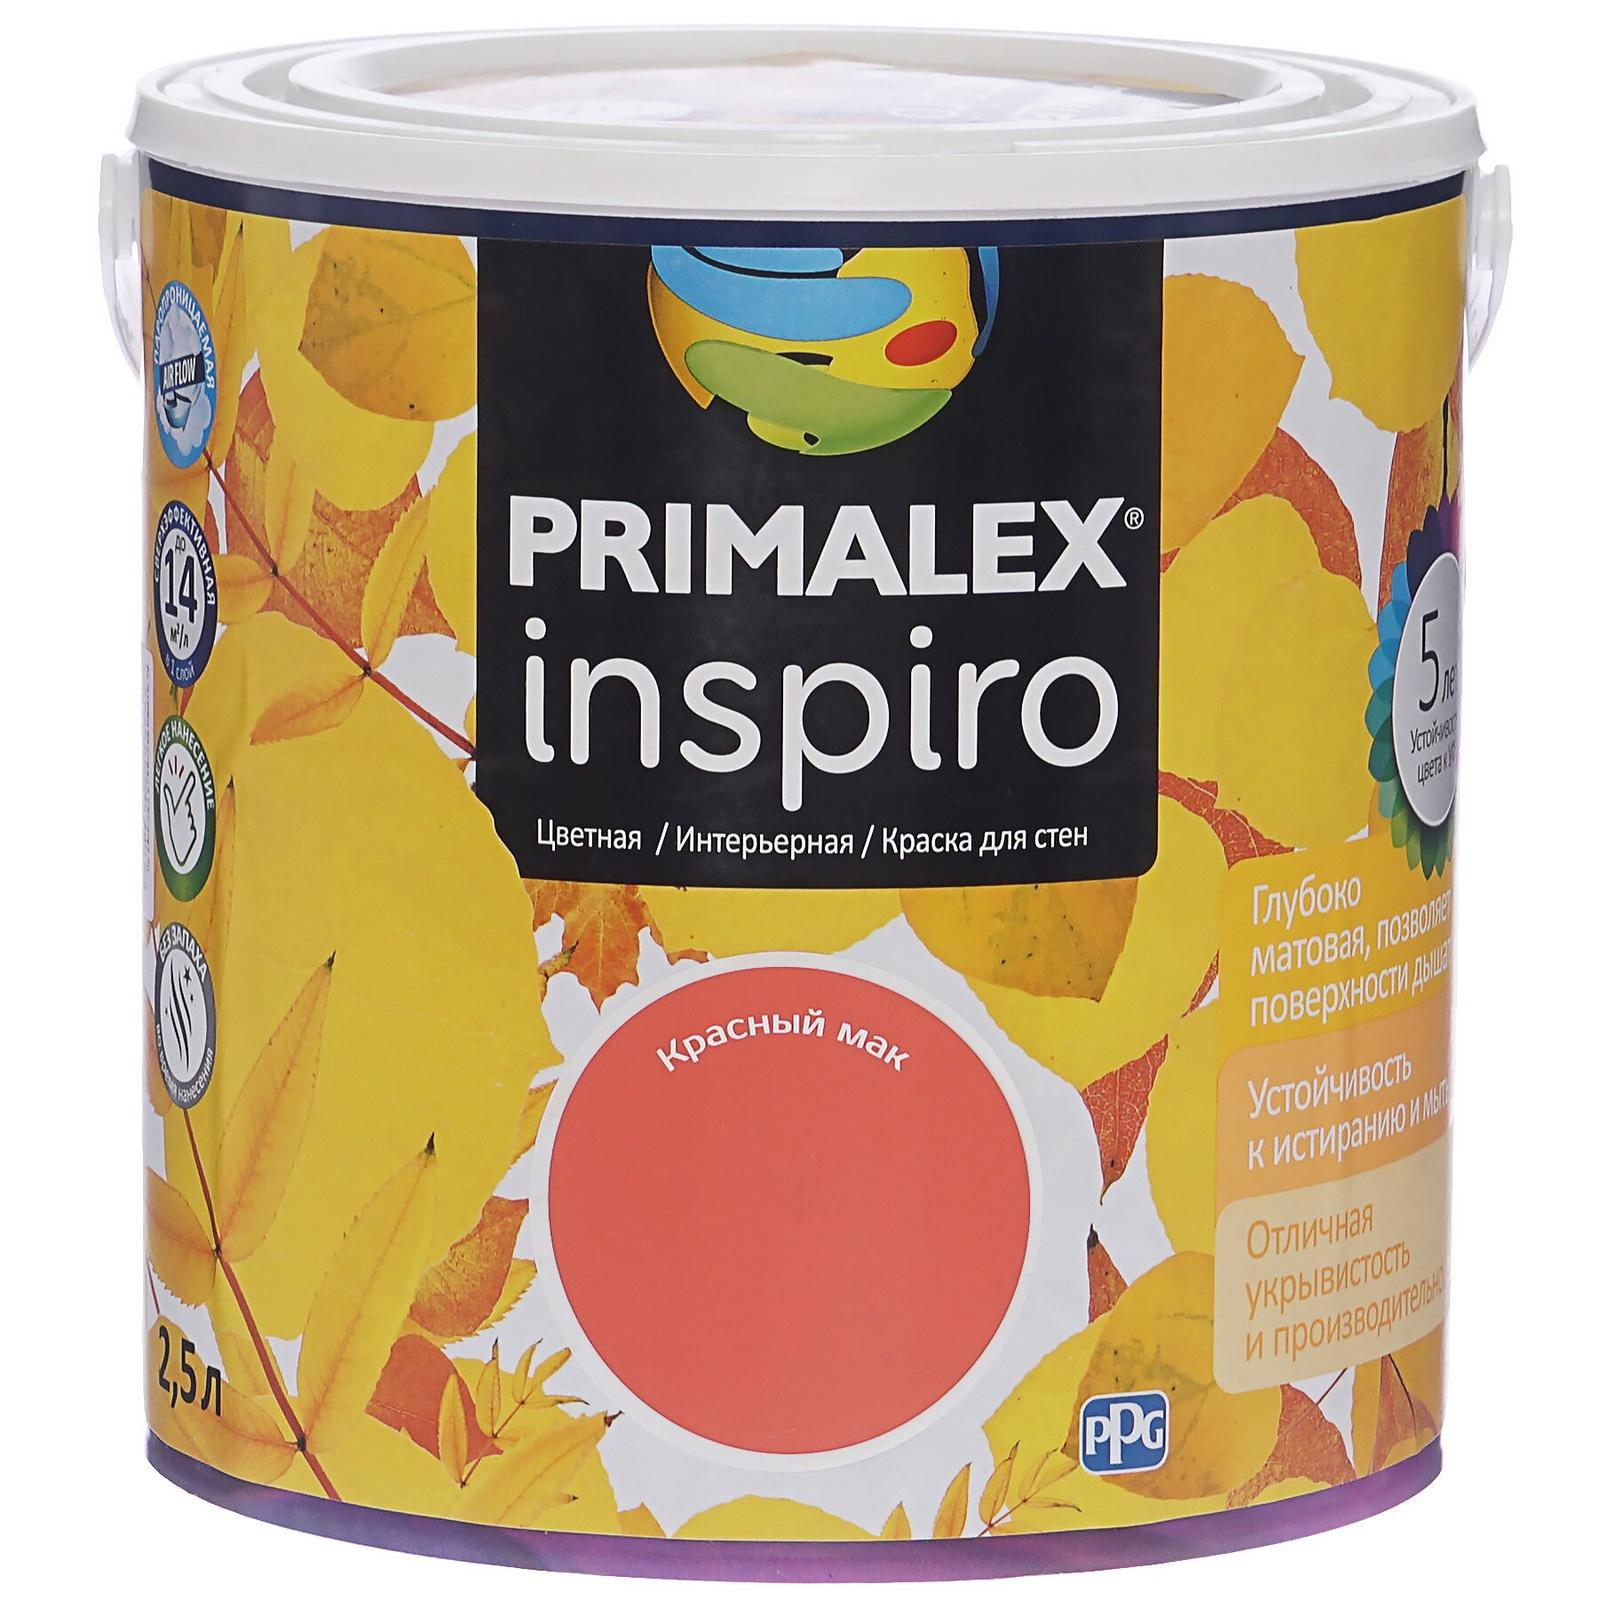 Краска Primalex Inspiro Красный Мак 2,5л краска ppg primalex inspiro красный мак 40мл pmx i47